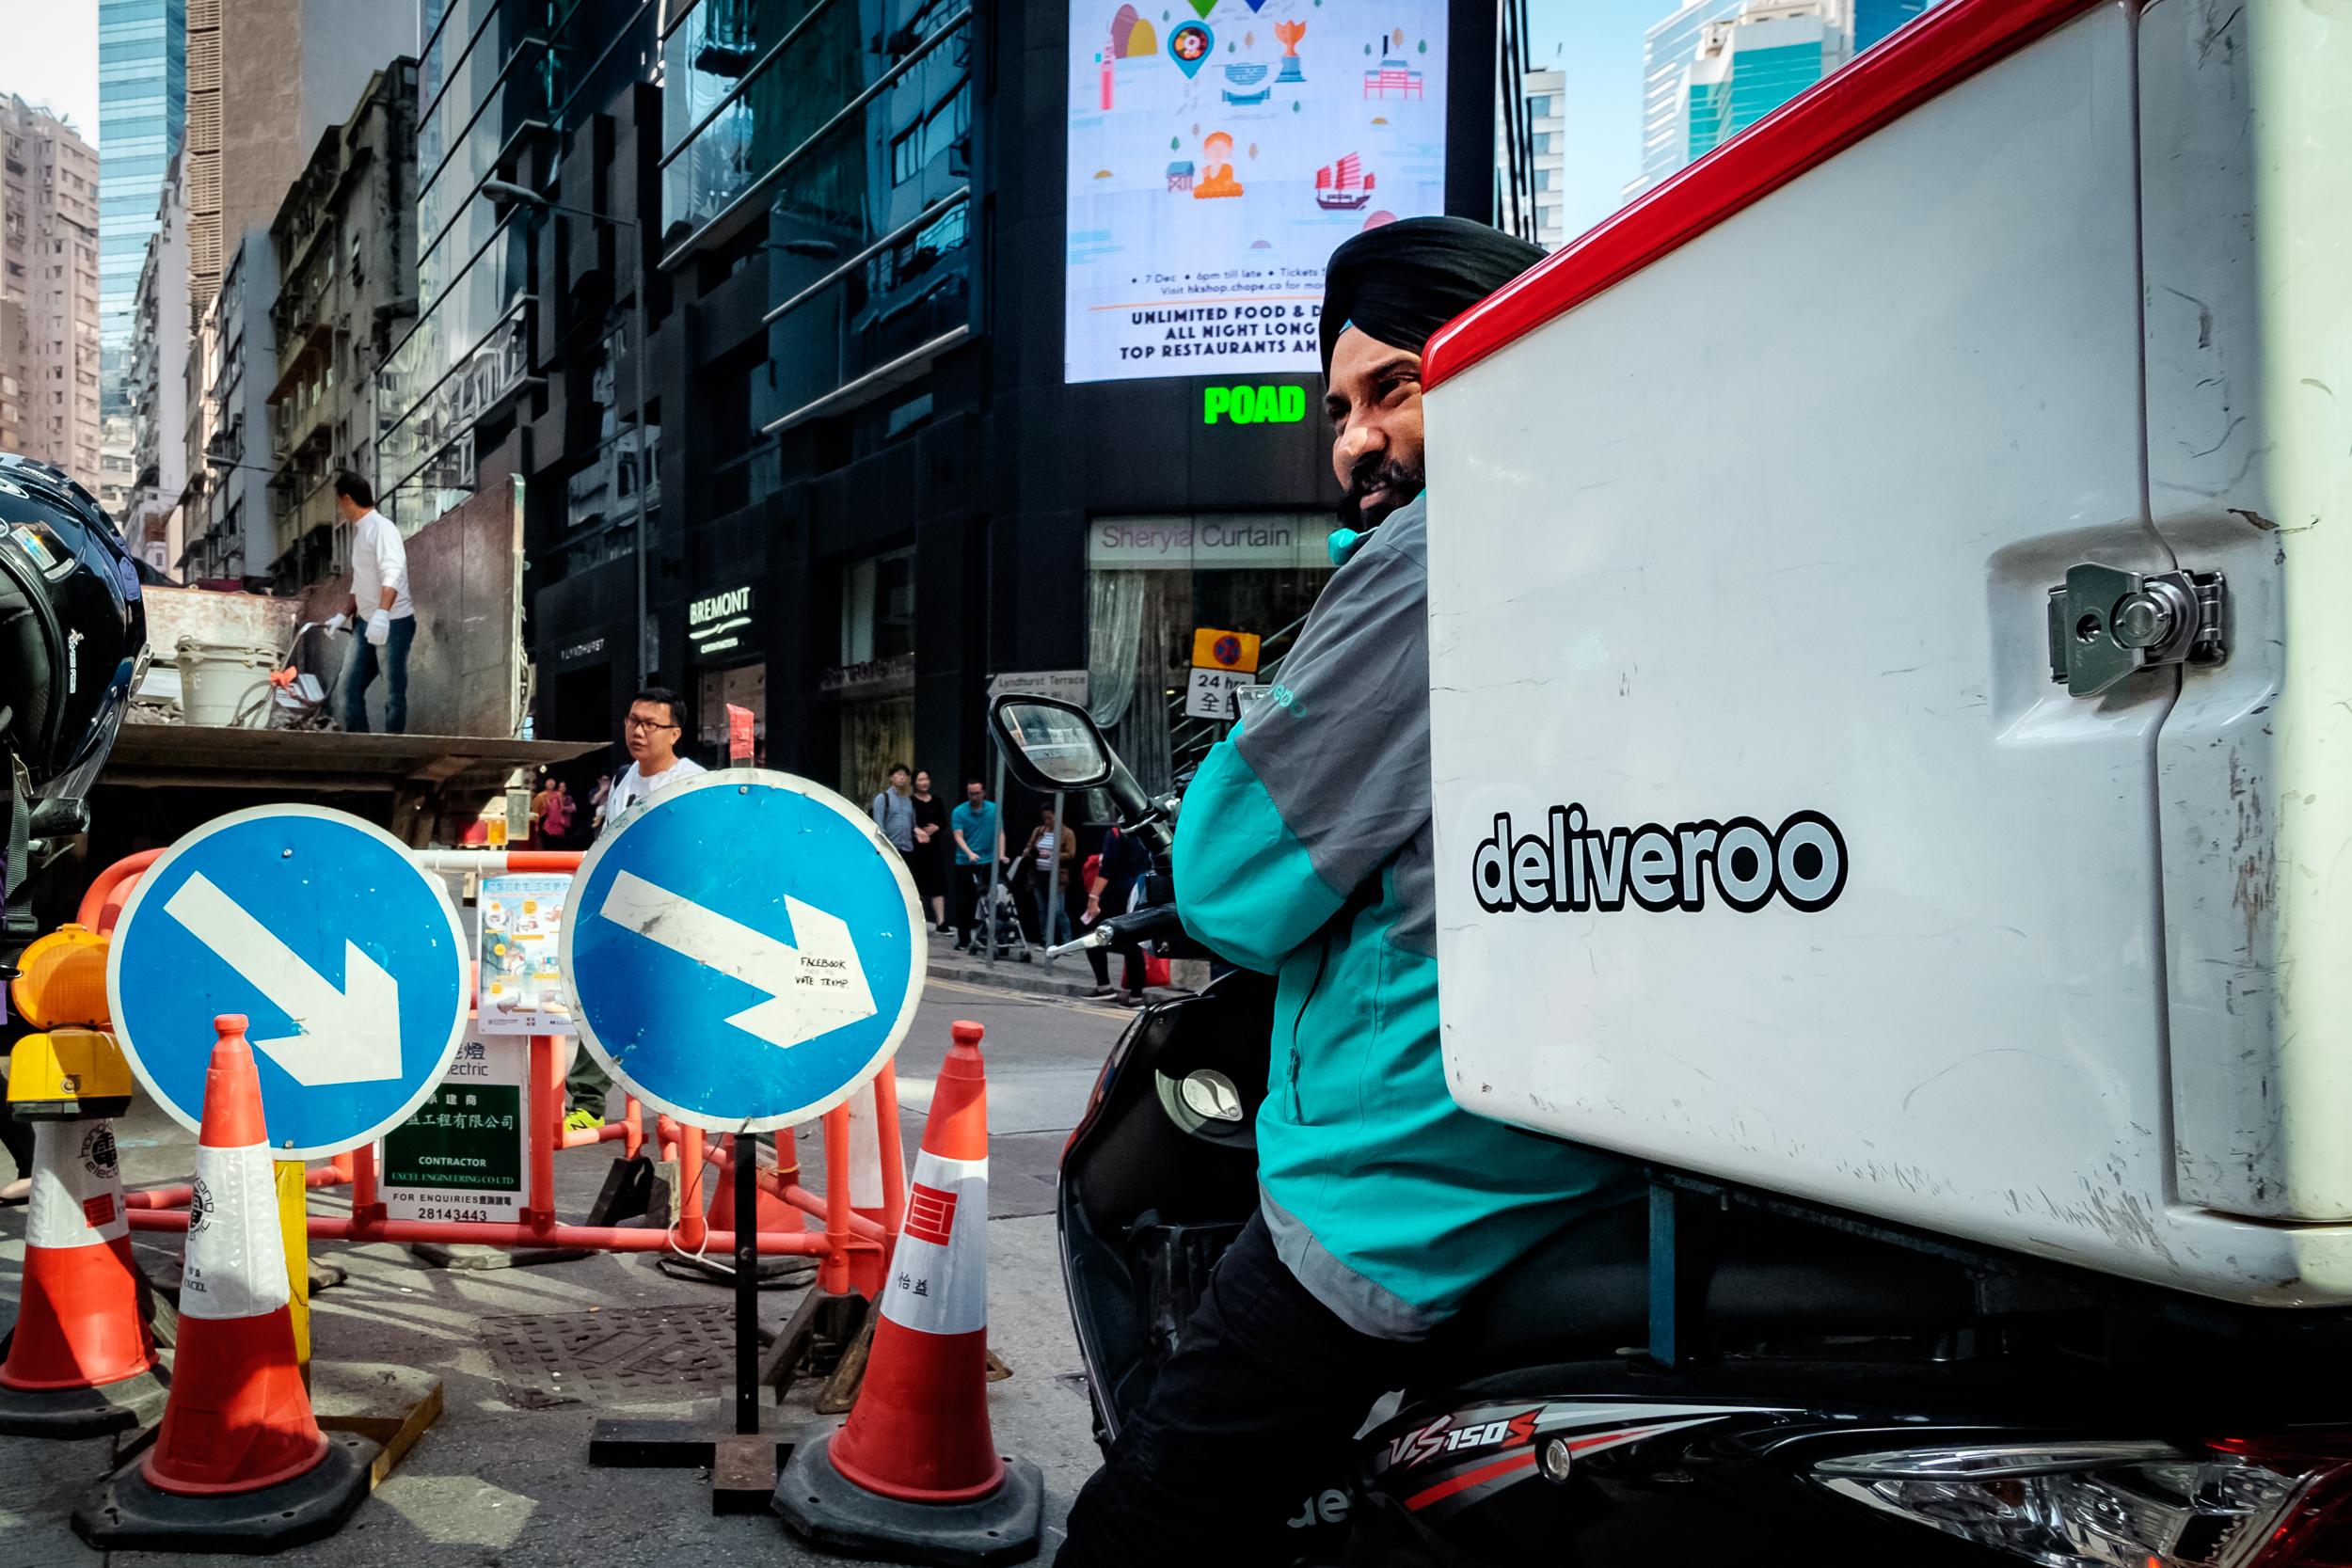 Central, Hong Kong |   LIMITED EDITION PRINT AVAILABLE   |